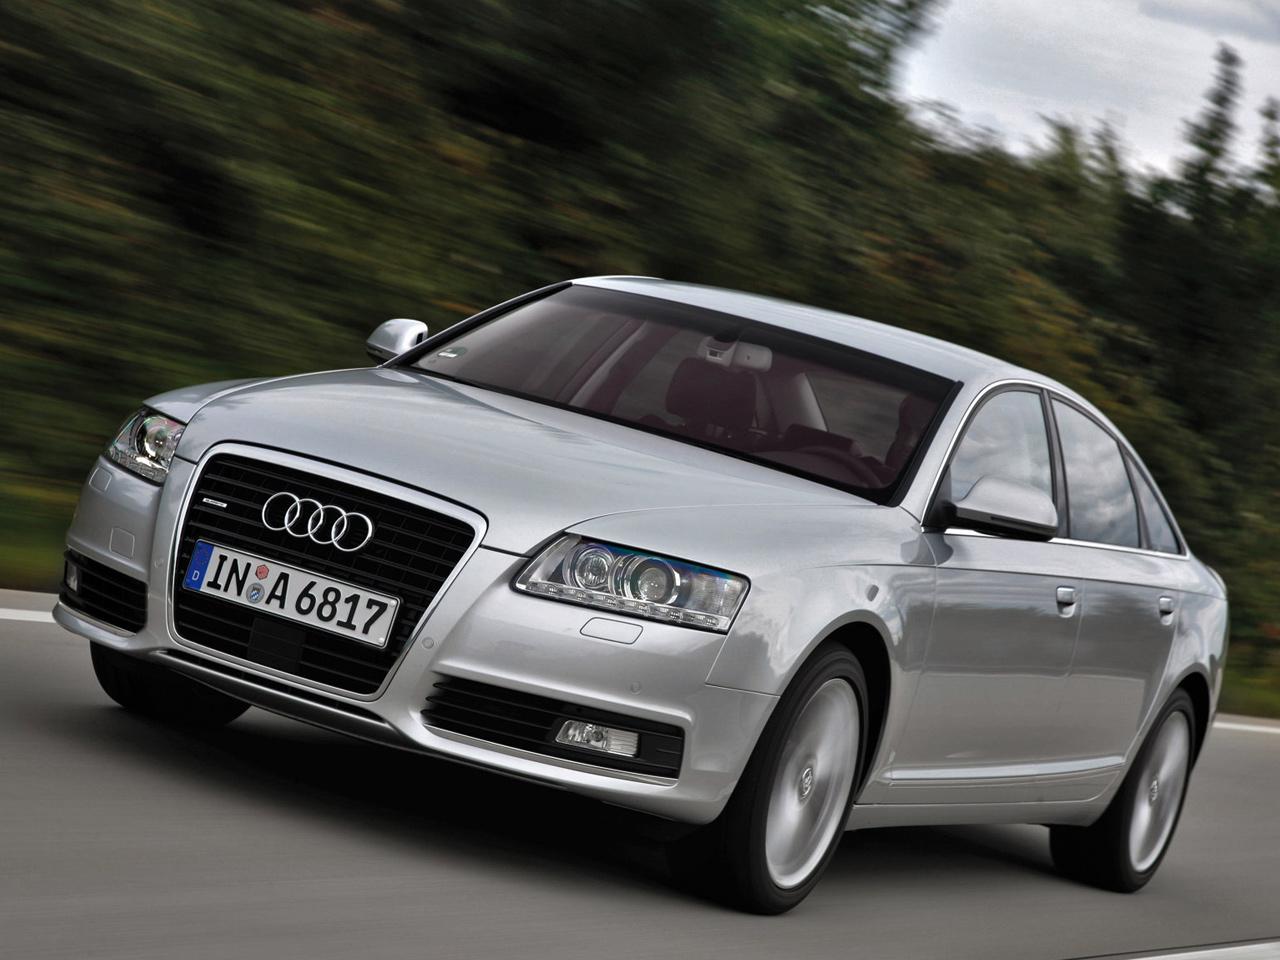 Картинка Ауди А 6 » Audi | Ауди ...: www.kartinki24.ru/kartinki/audi/2814-kartinka-4.html